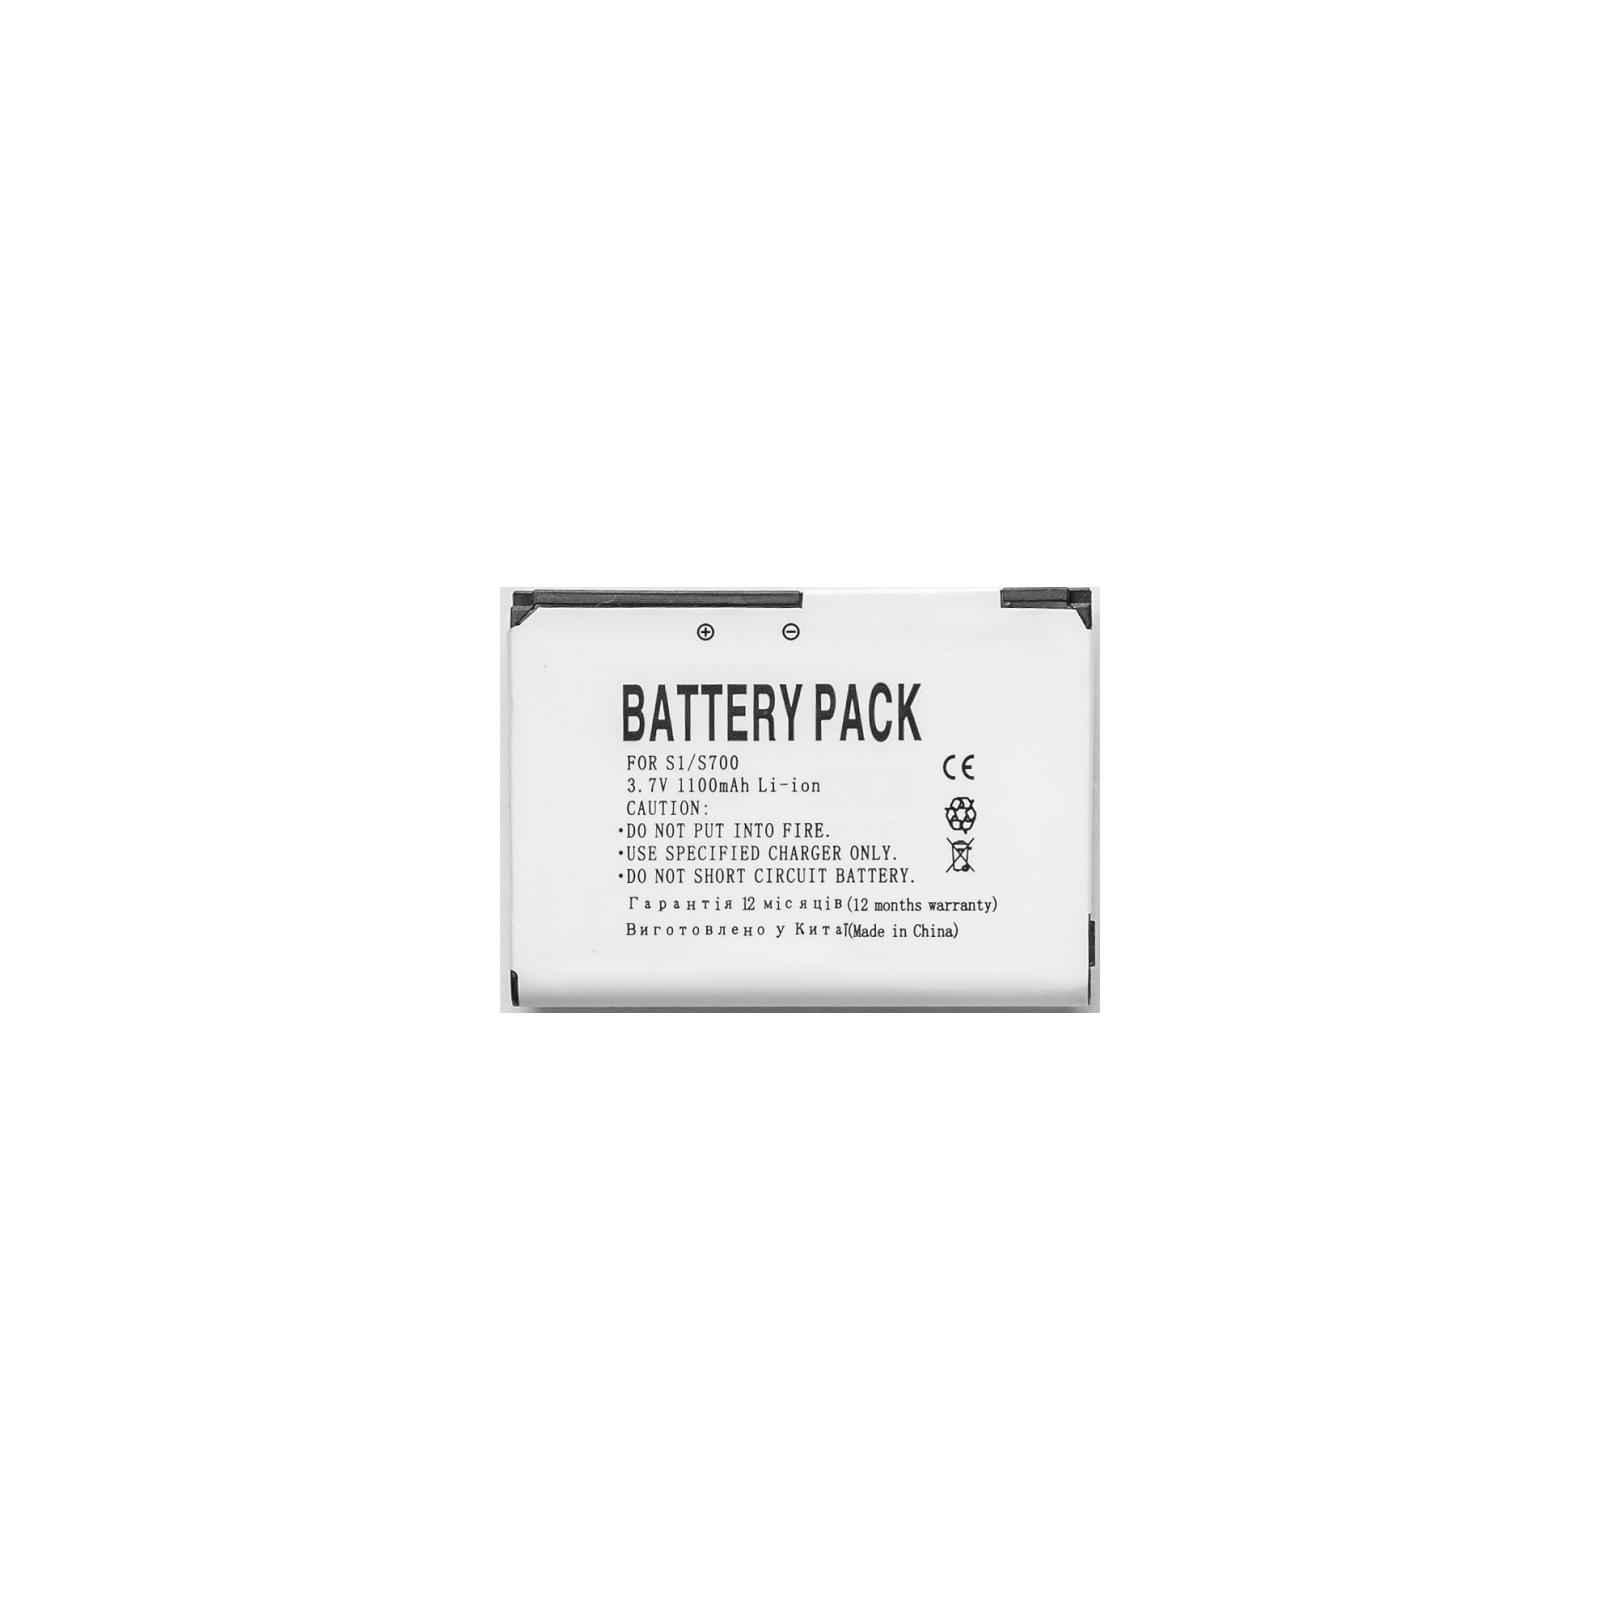 Аккумуляторная батарея PowerPlant HTC ELF0160 (S1, S700, S500, S505, P3450, P3452, VX6900) (DV00DV6161) изображение 2